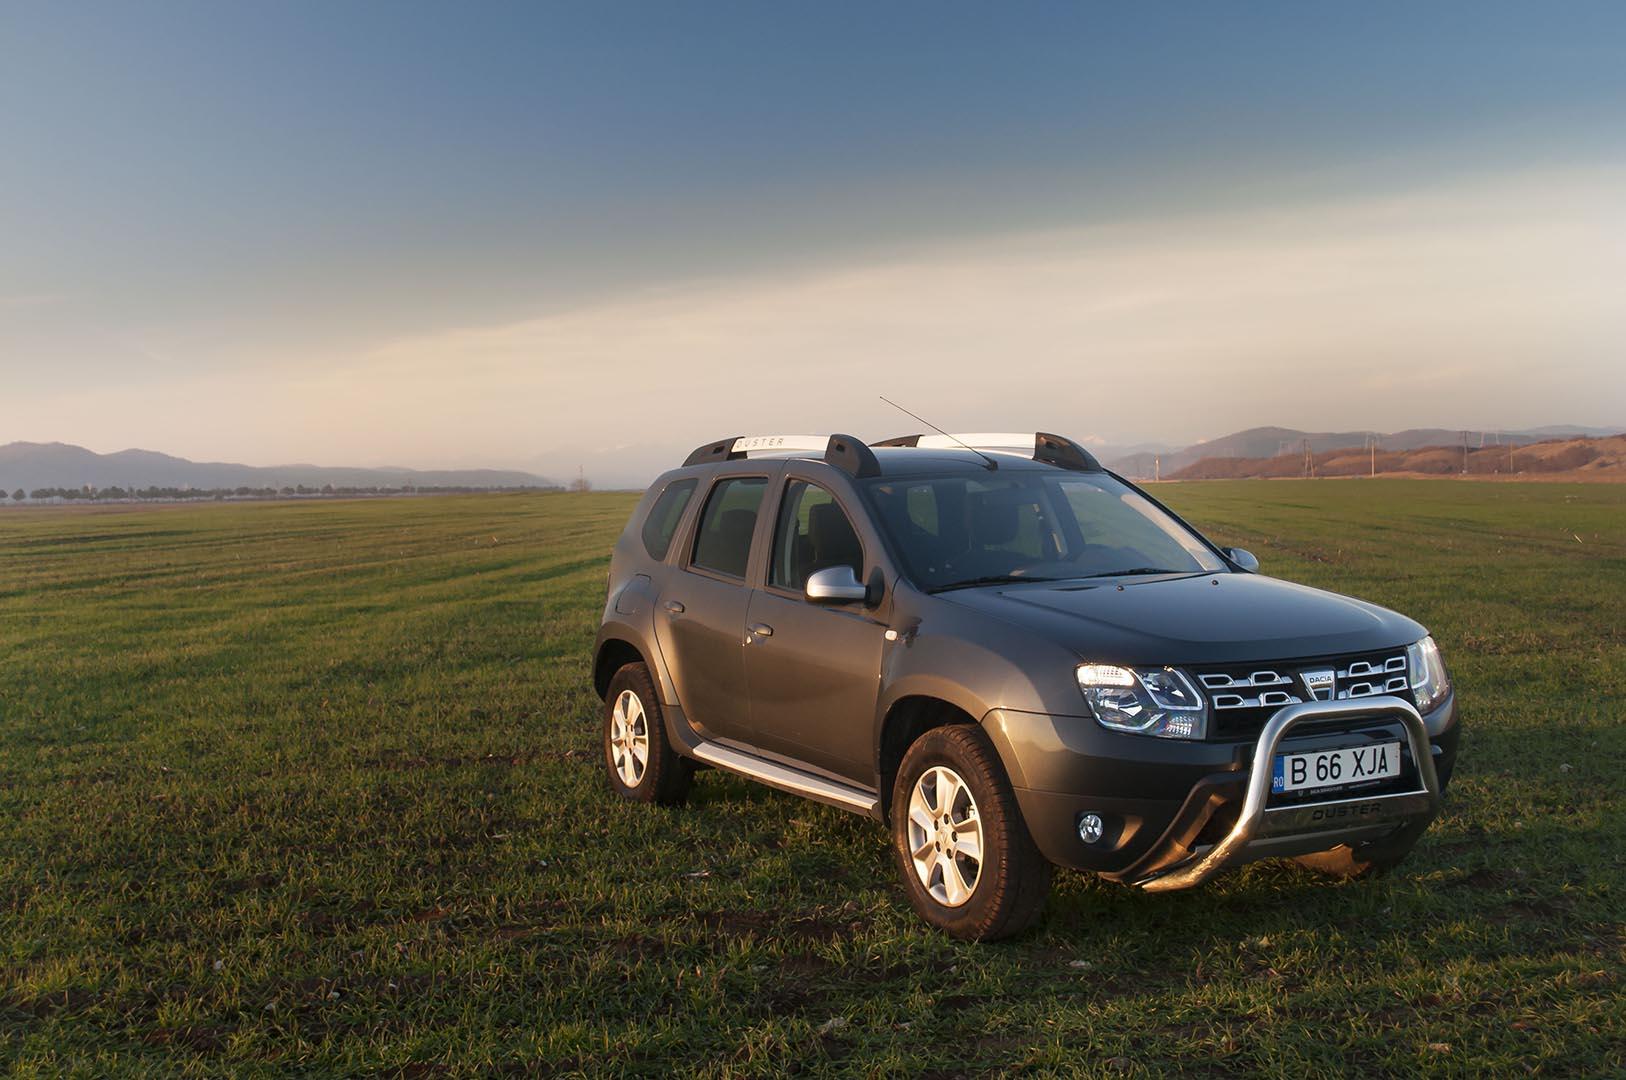 Drive test Dacia Duster Facelift 1.5 dCi 110CP 4X4 Laureate